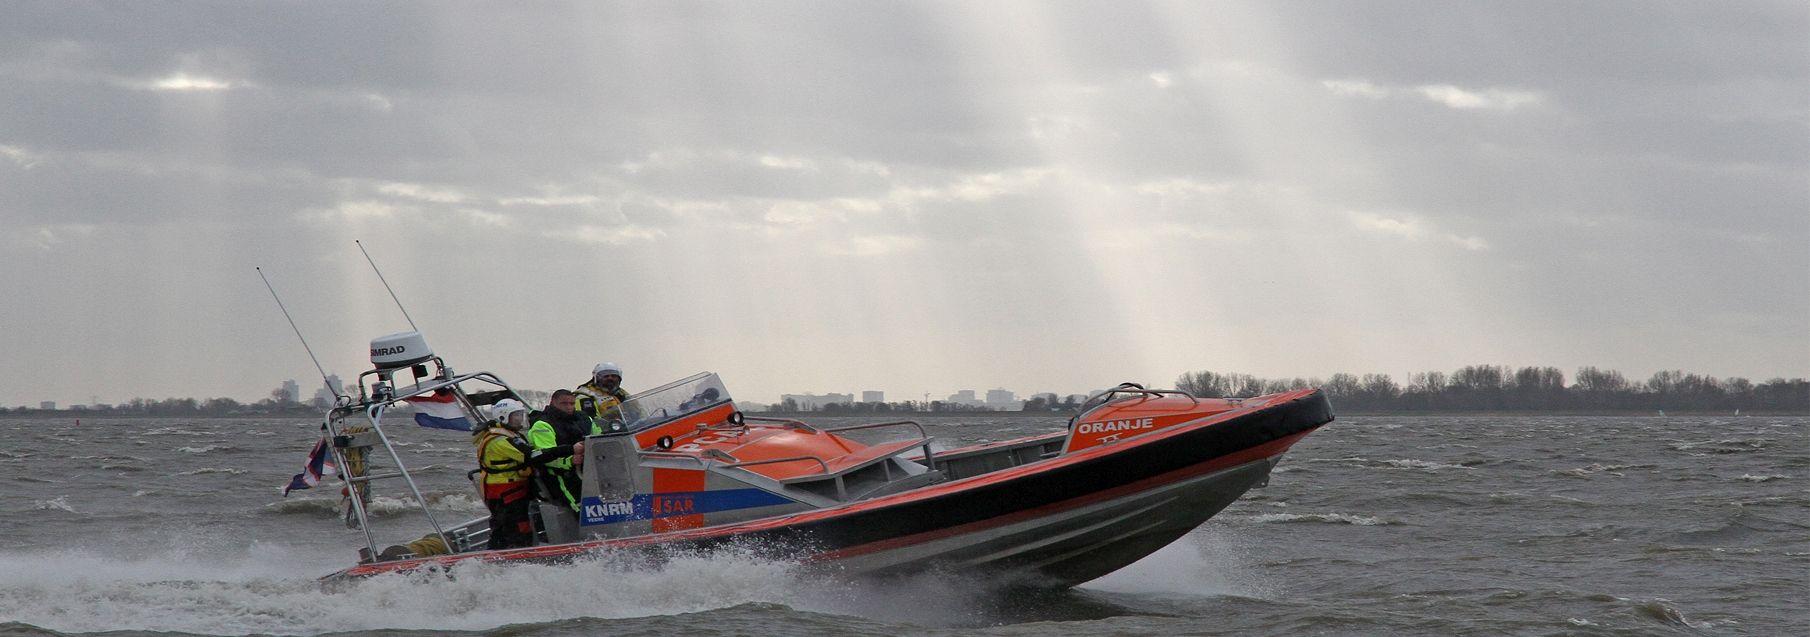 Reddingboot Oranje